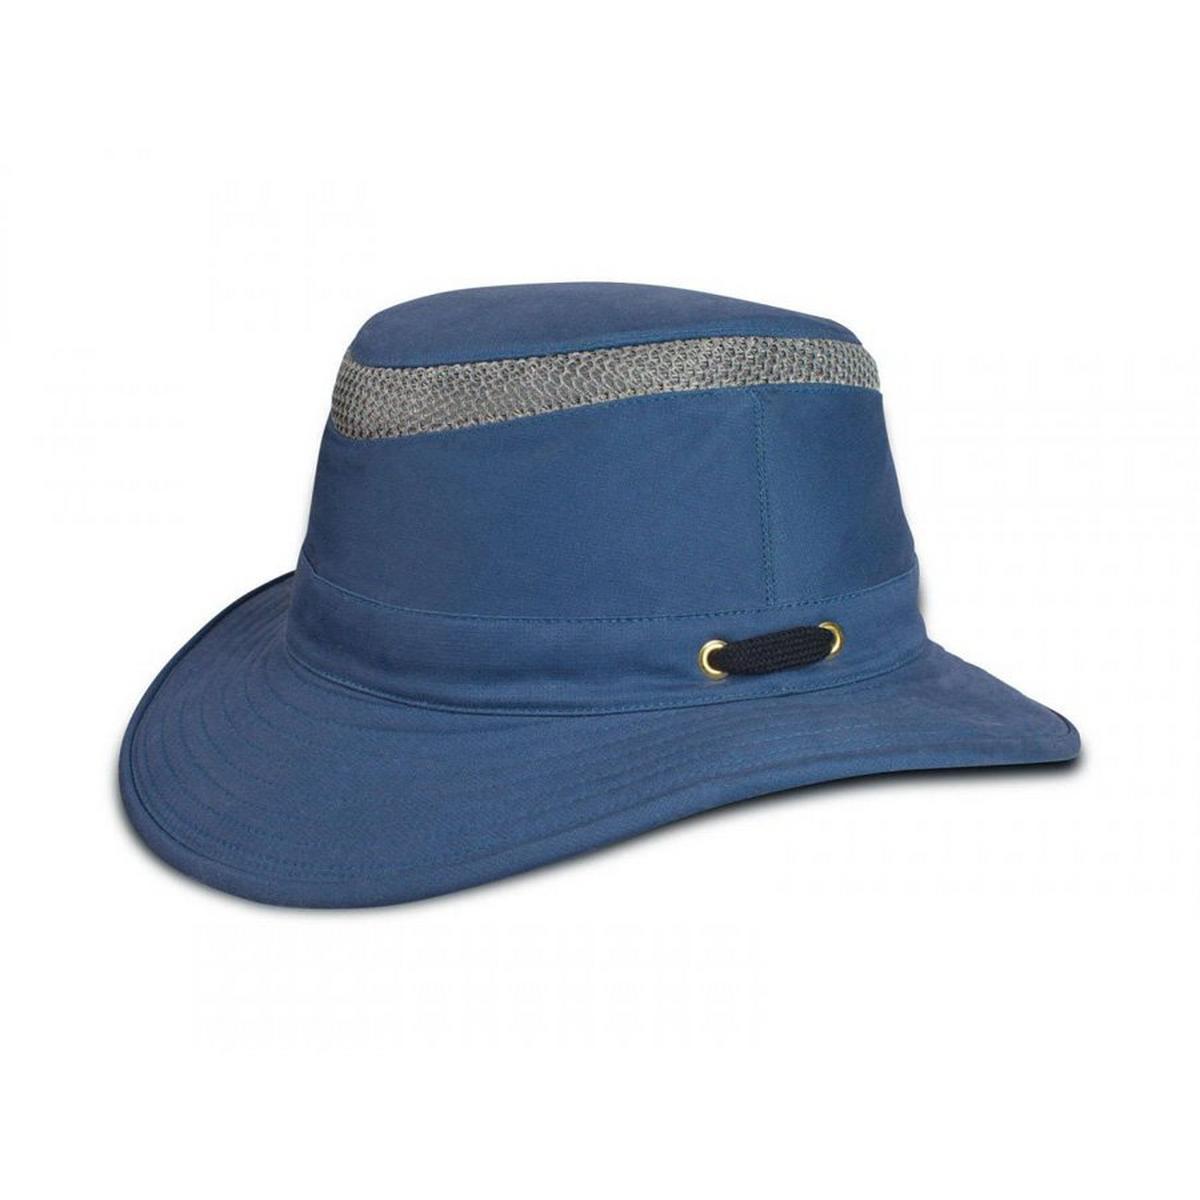 Tilley Endurables Tilley Hat T5MO Airflo Medium Brim Organic Cotton Mid-Blue